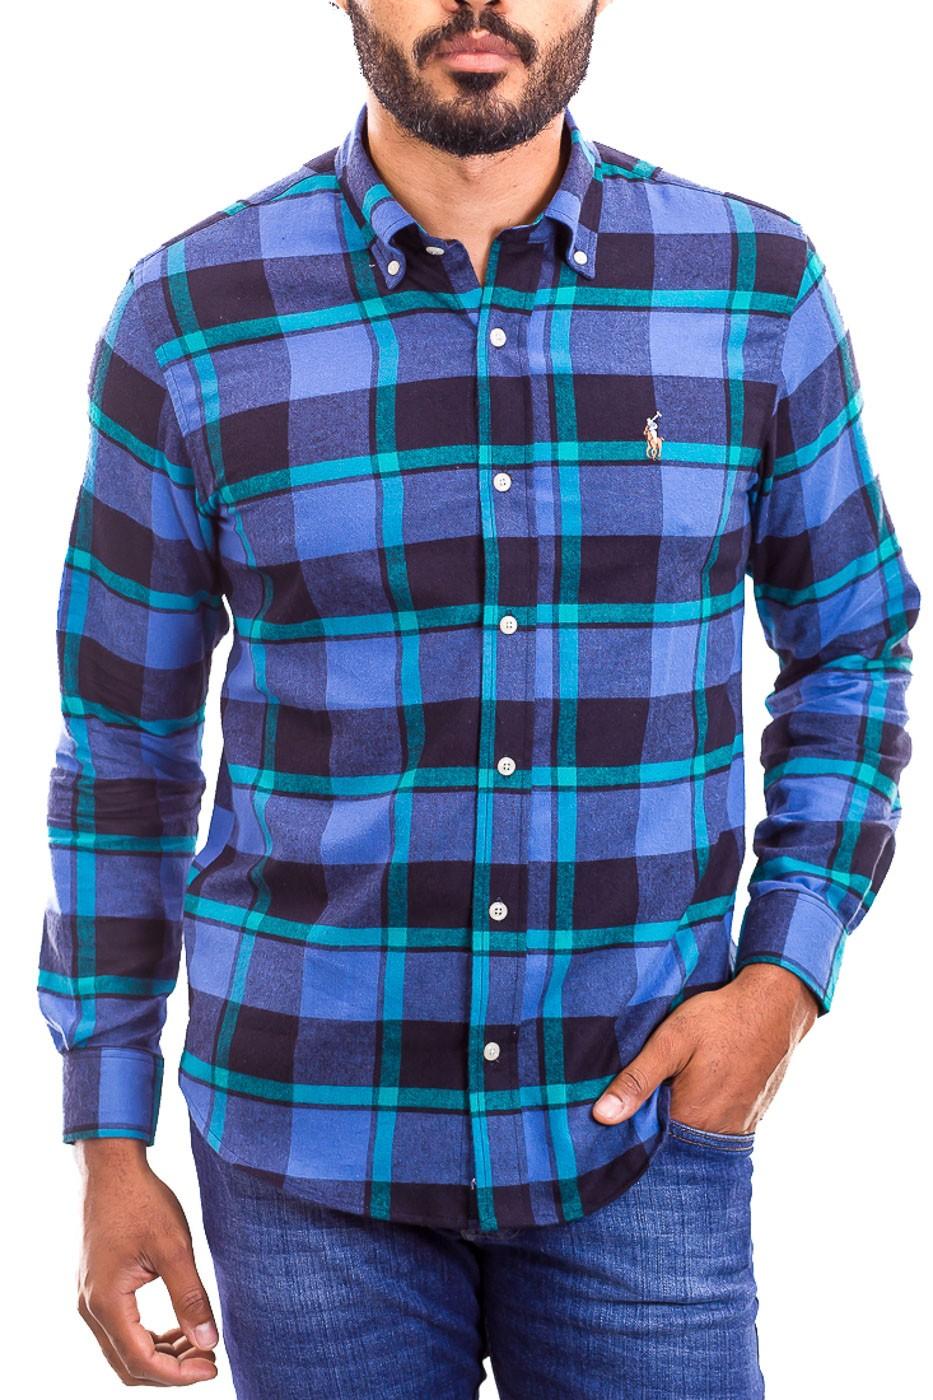 Camisa Ralph Lauren Masculina Custom Fit Xadrez Check Flannel Colors Icon Azul